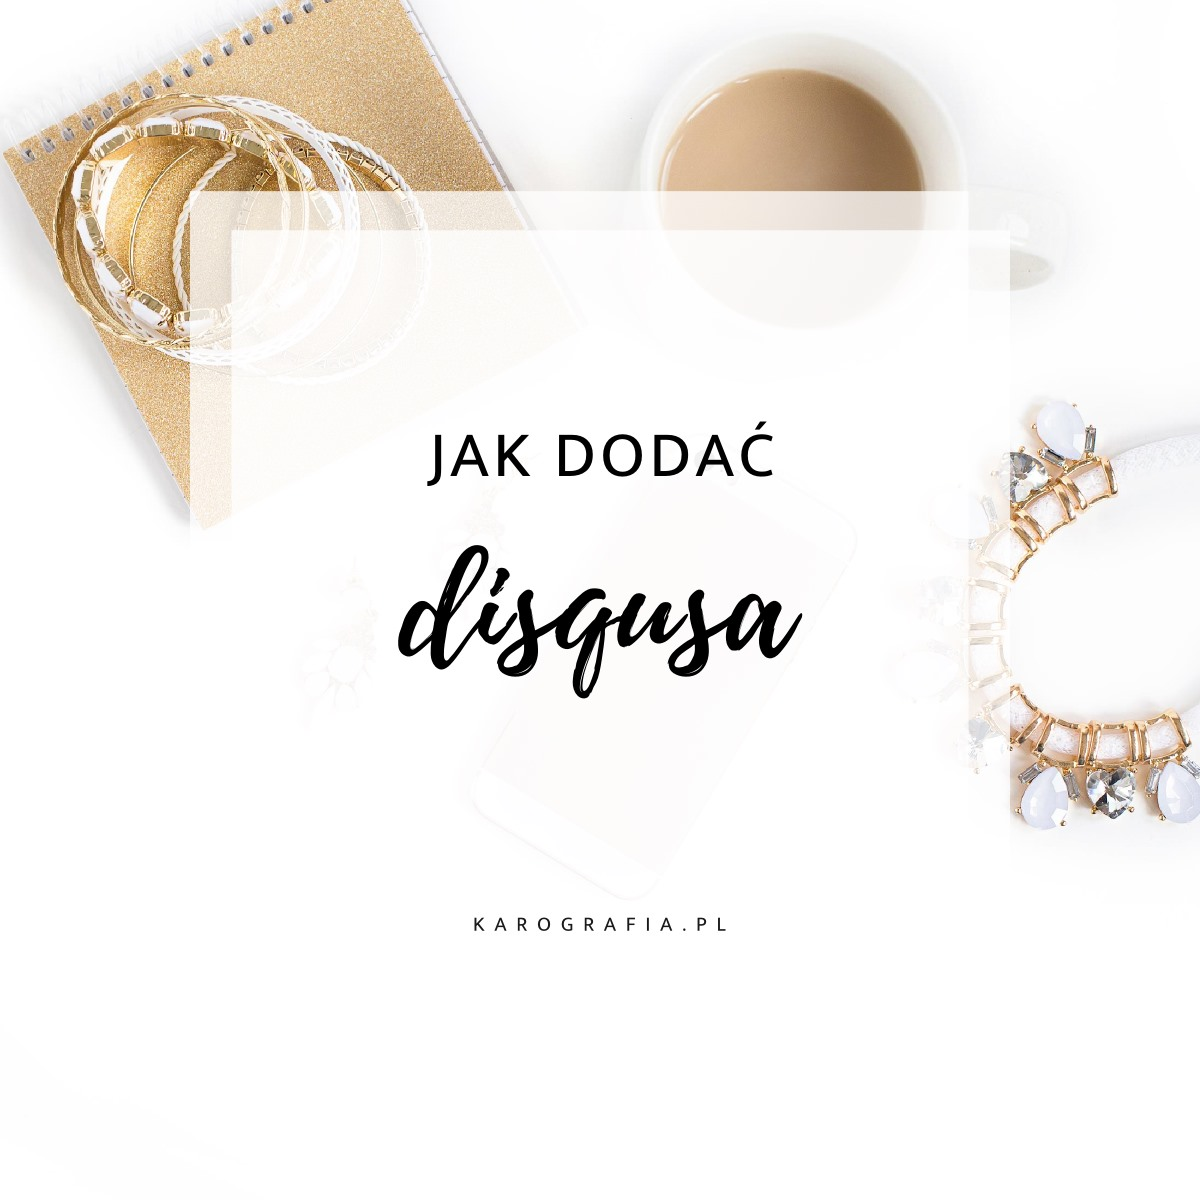 Jak dodać Disqusa do Bloggera? Instrukcja krok po kroku!